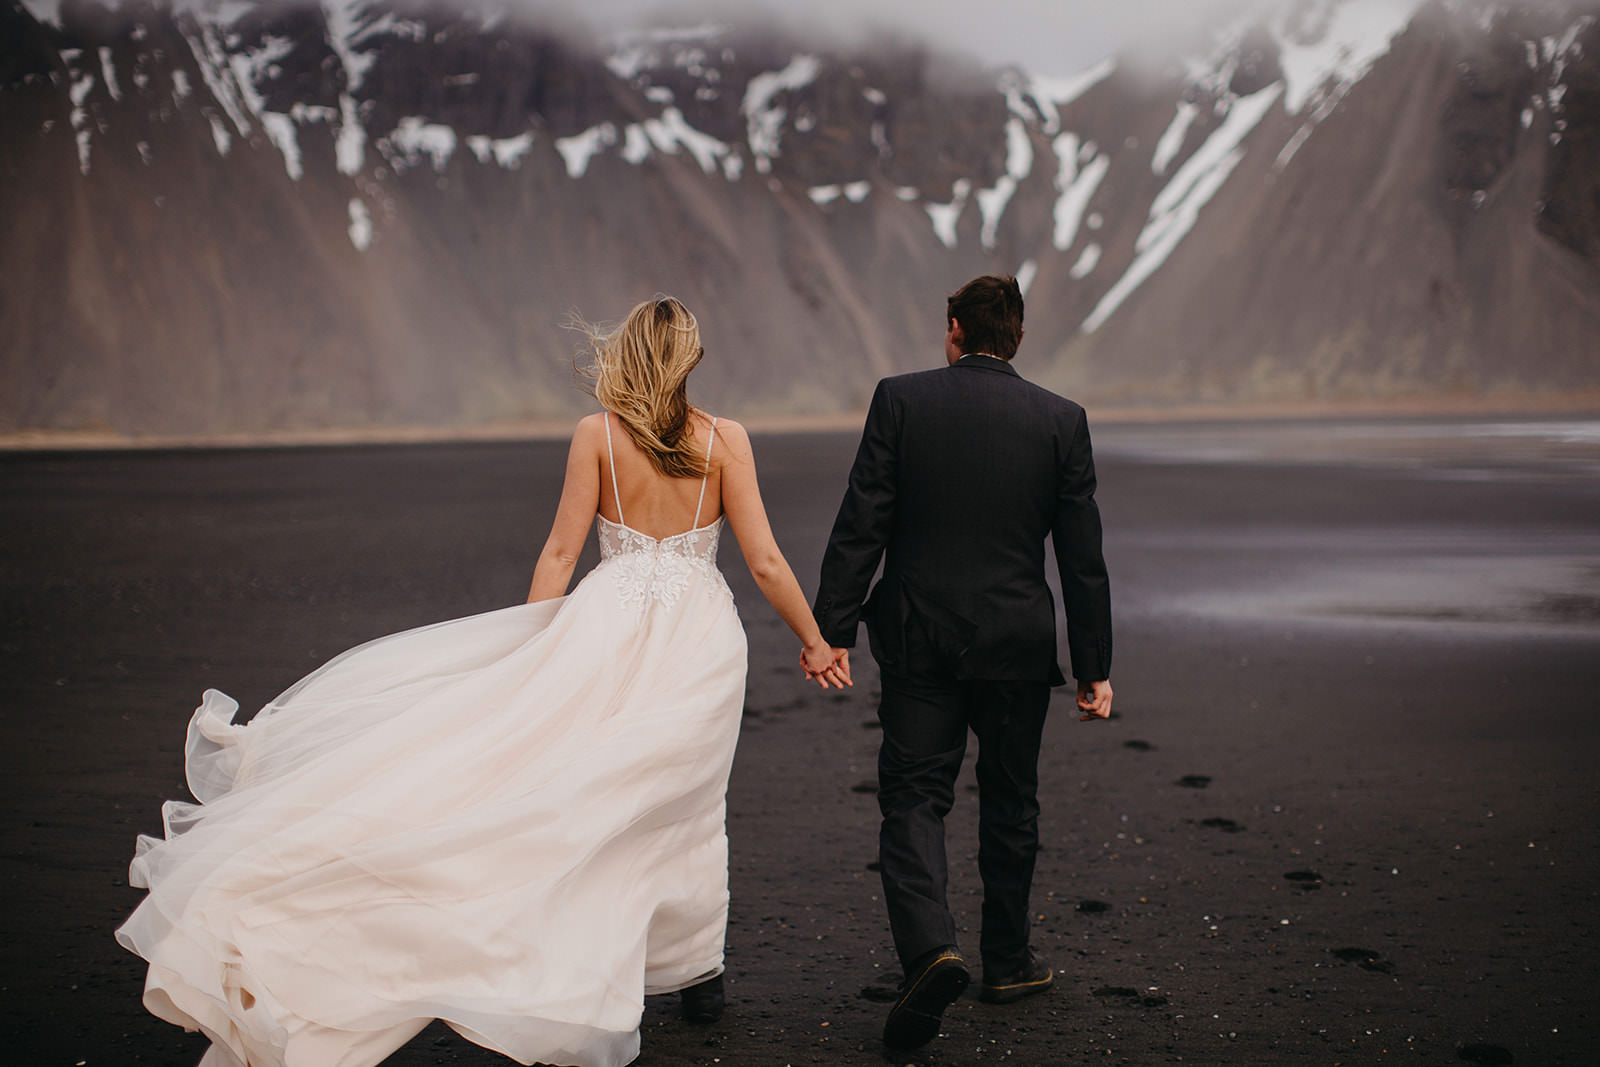 Icelandic Iceland Elopement Wedding Elope Photographer Eloping Reykjavík Vik Black Sand Beach Jökulsárlón Skogafoss Waterfall Vestrahorn Mountain Liz Osban Photography Destination 40.jpg